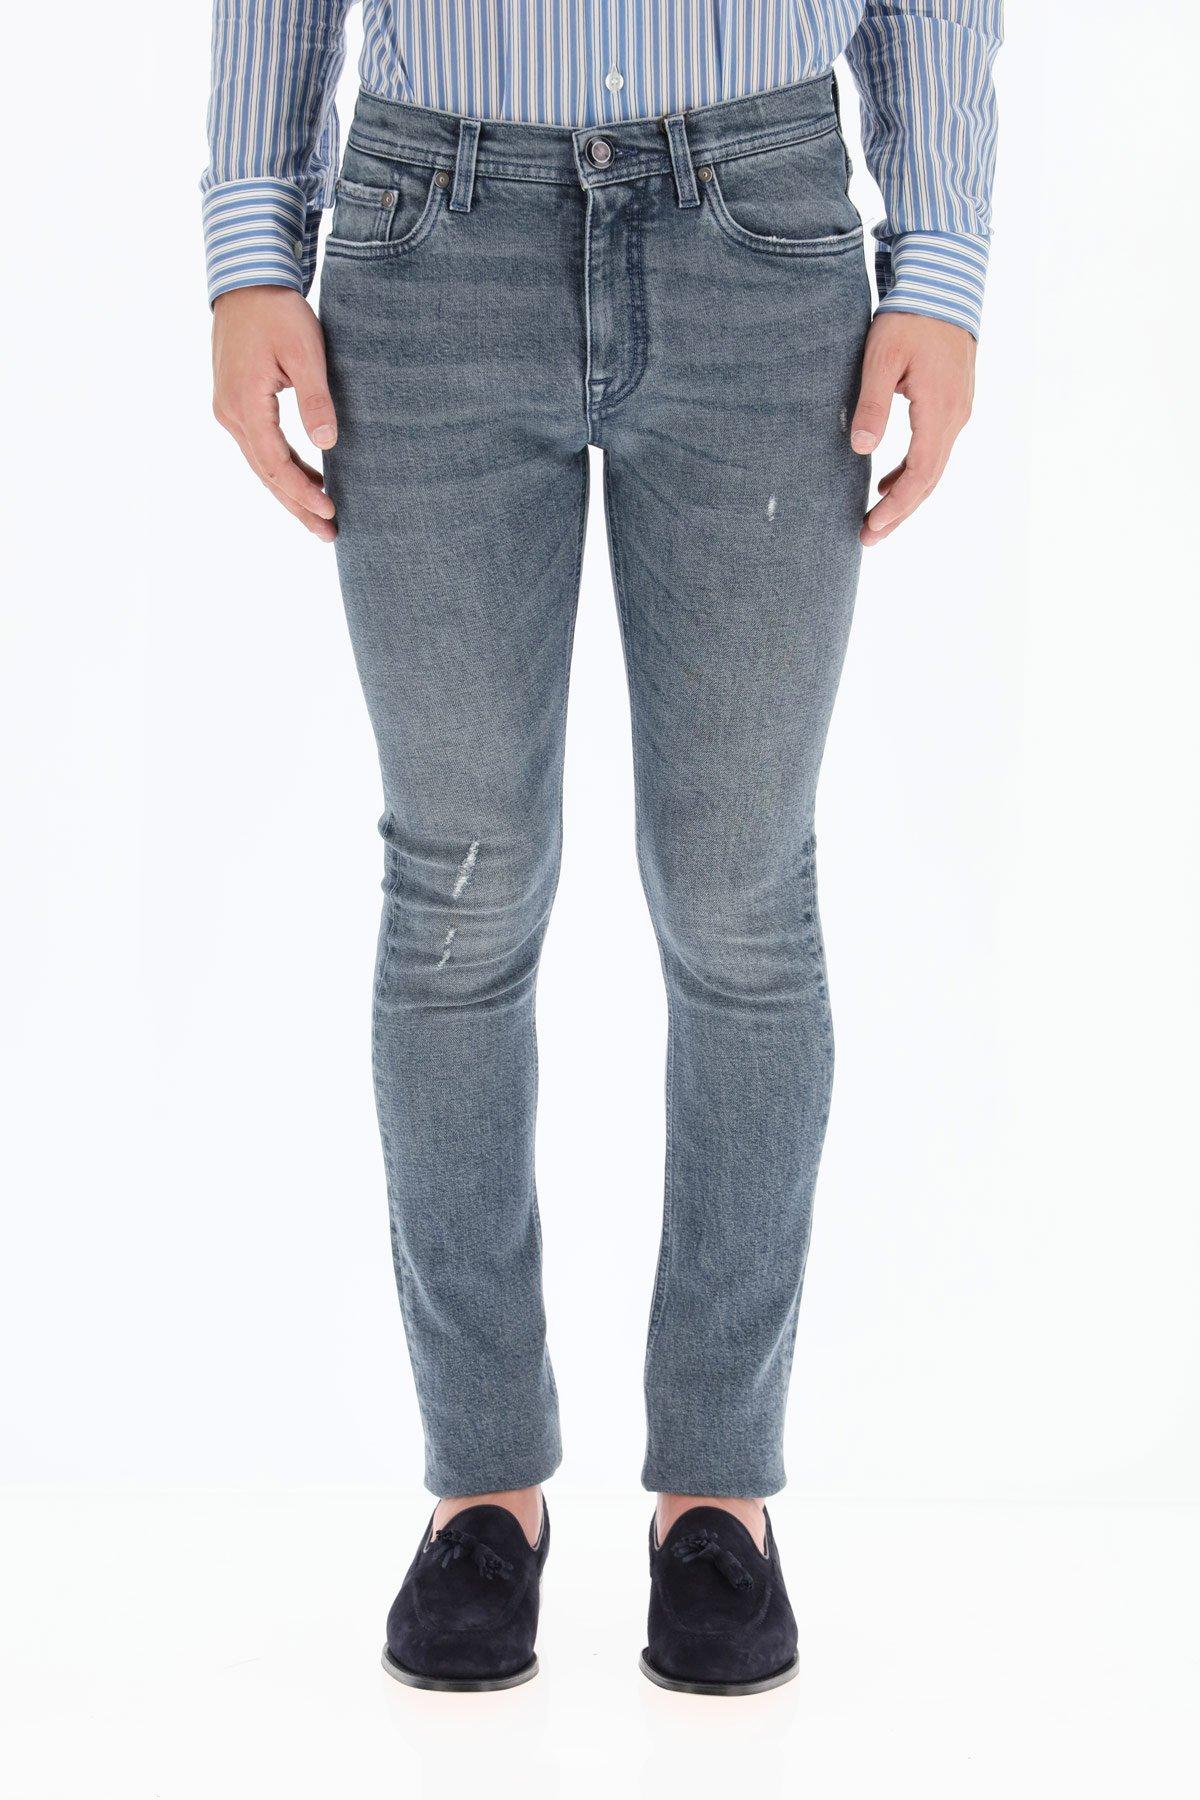 Etro jeans logo ricamato